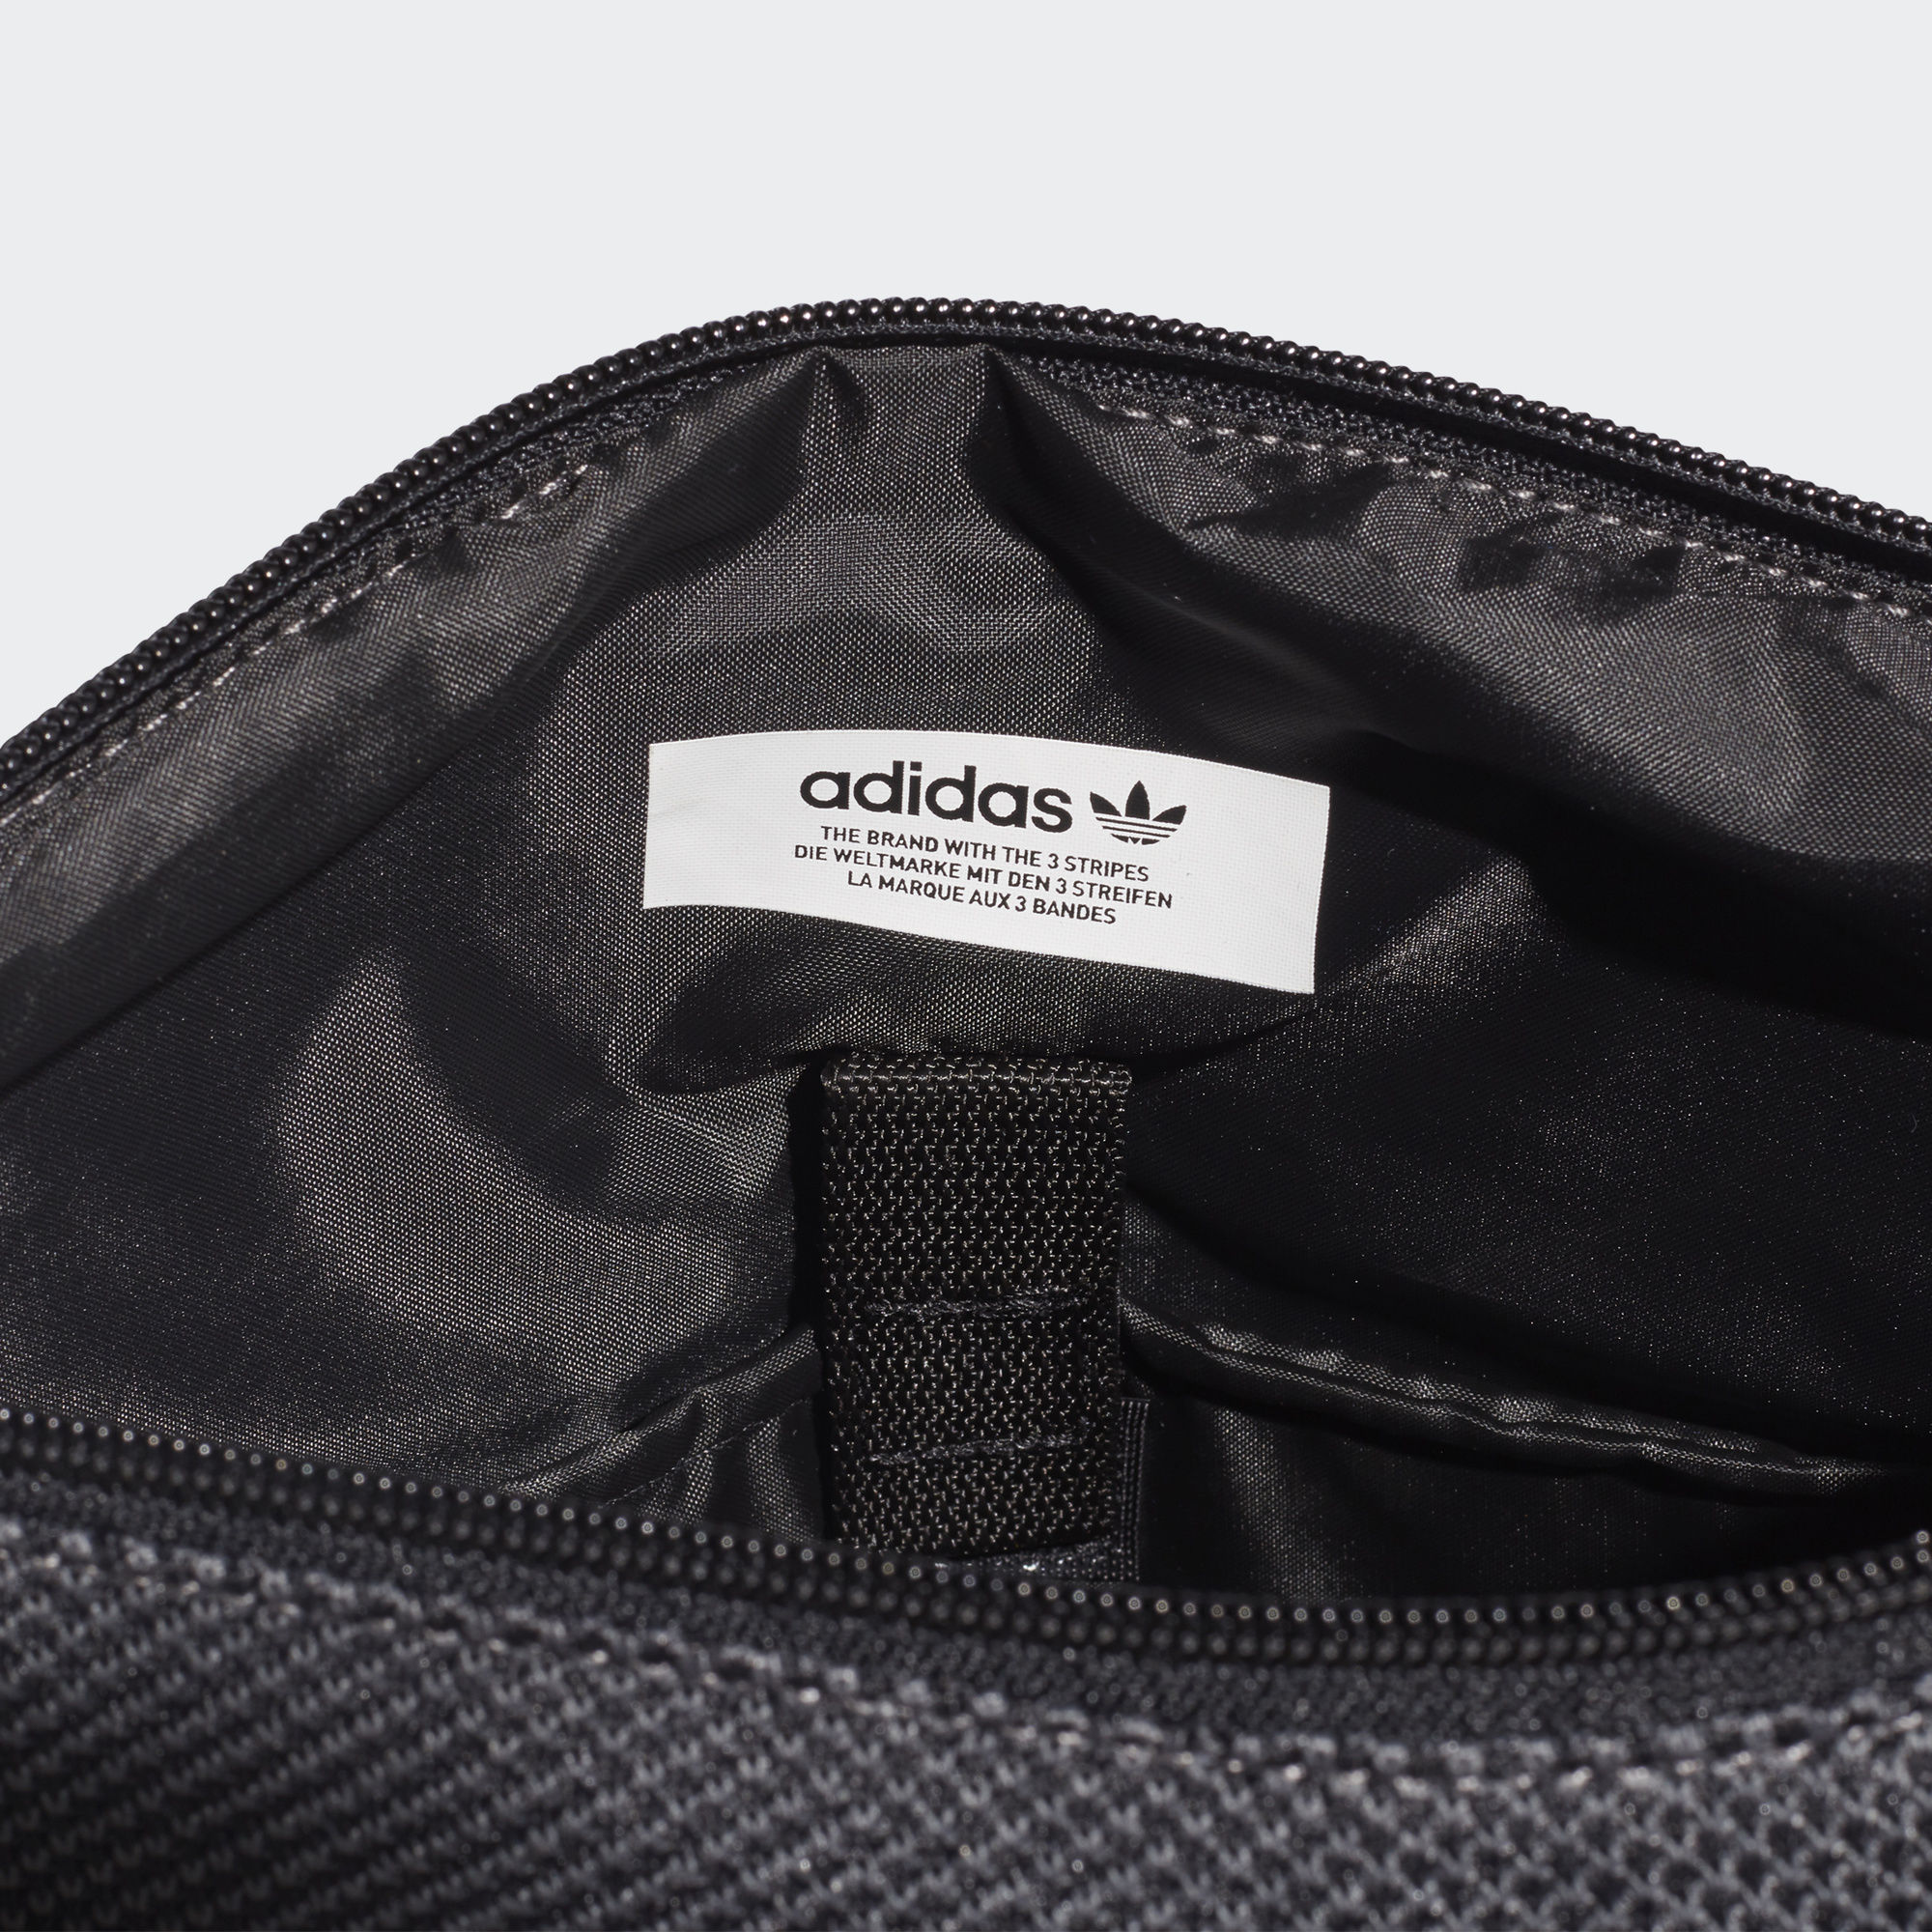 adidas NMD DH3078 Adidas Originals